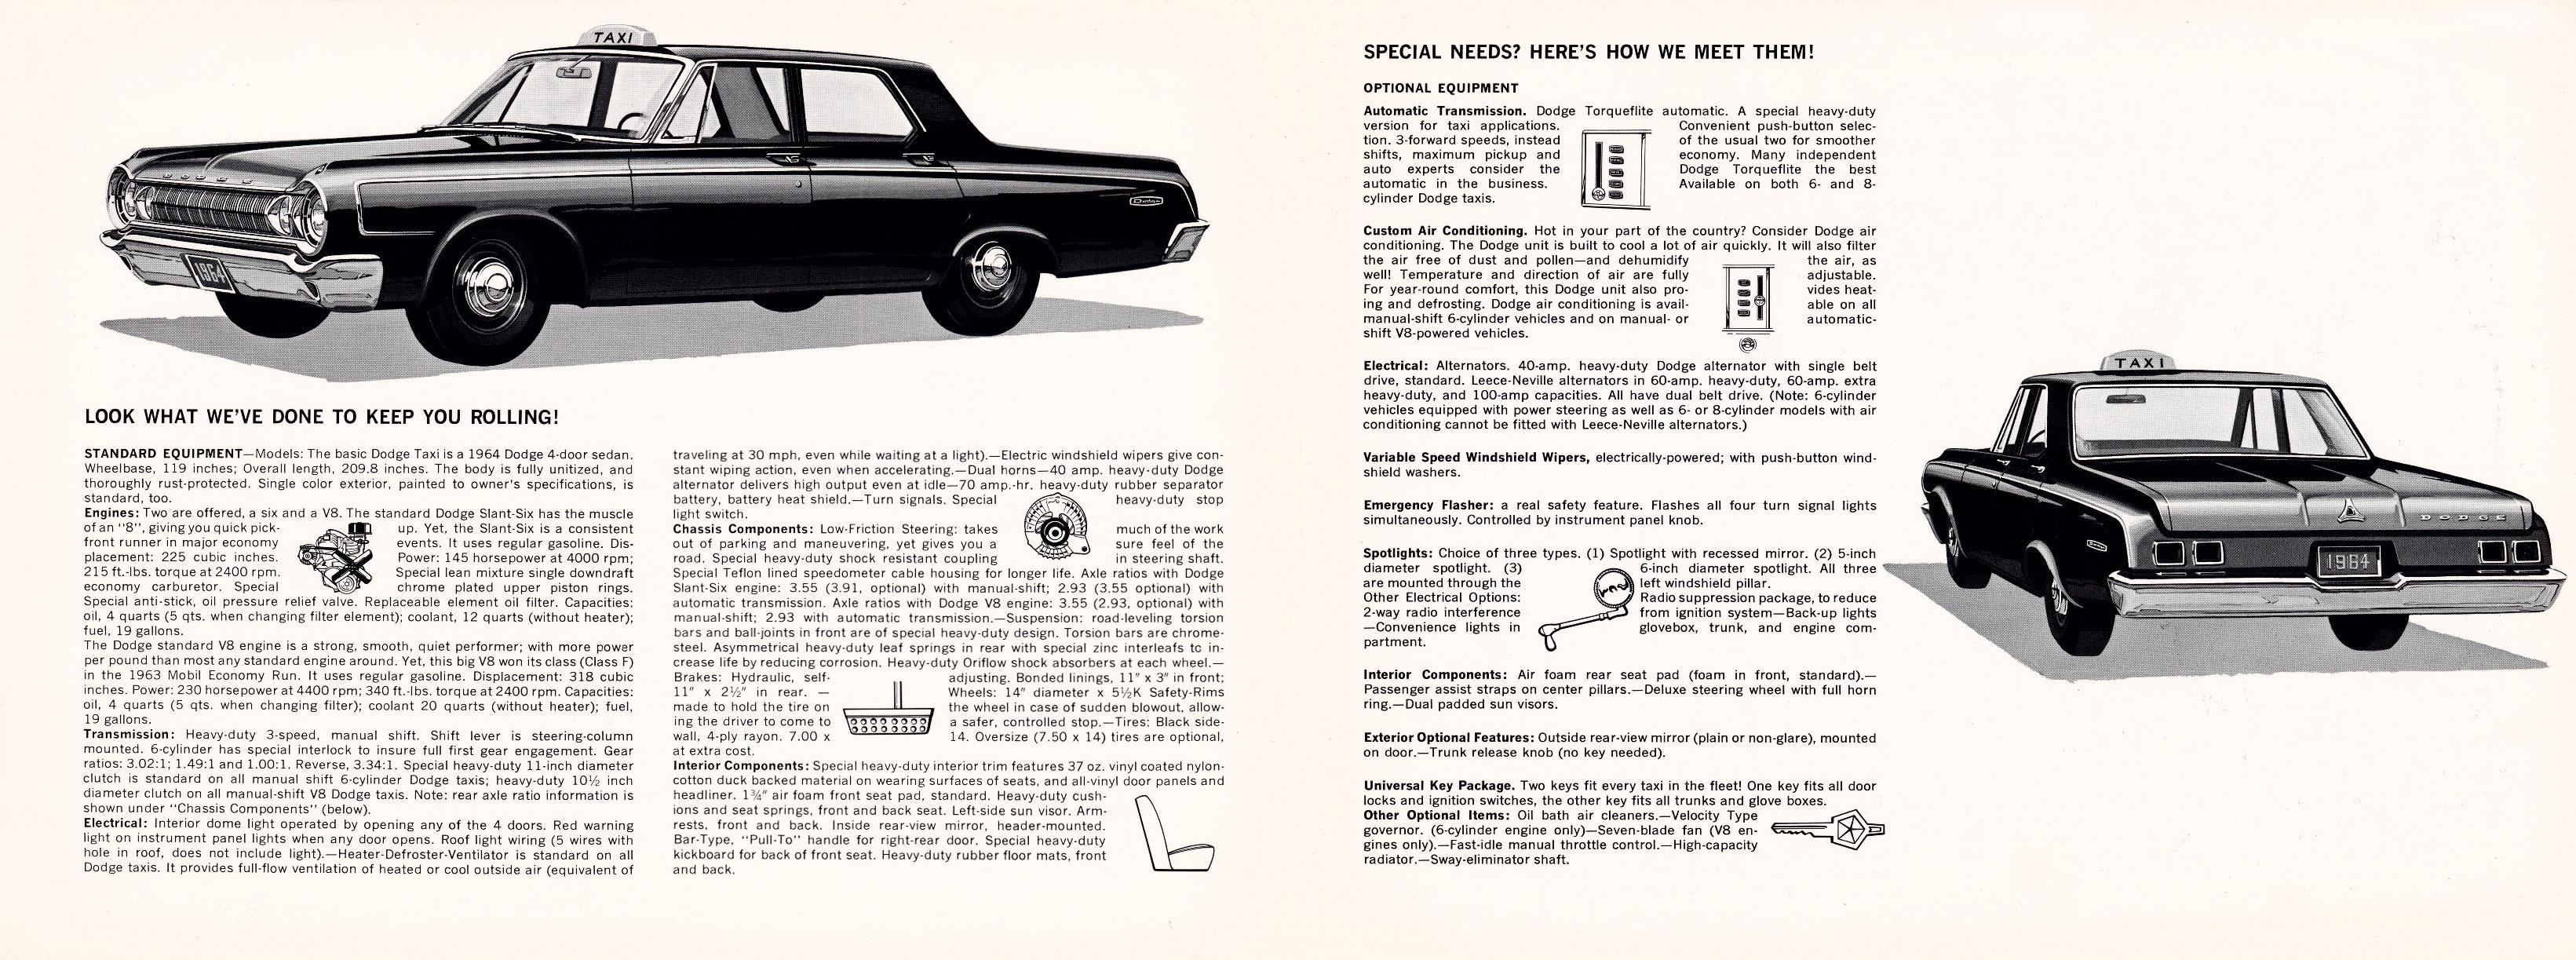 1964 Dodge Taxi Brochure Leece Neville Pad Mount Alternator Wiring Diagram Full Size Image